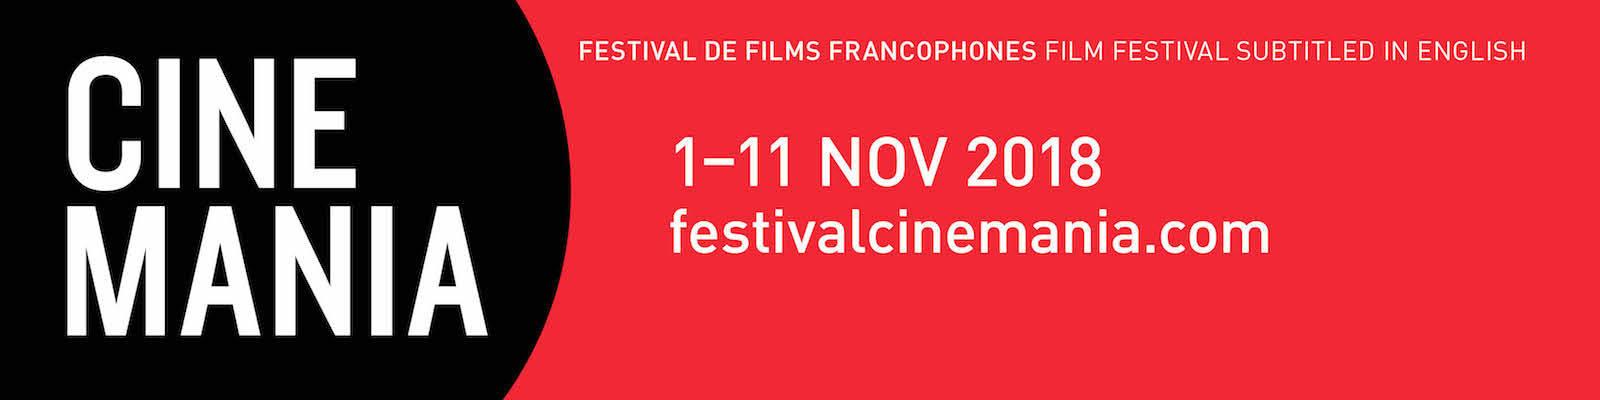 FESTIVAL CINEMANIA 2018